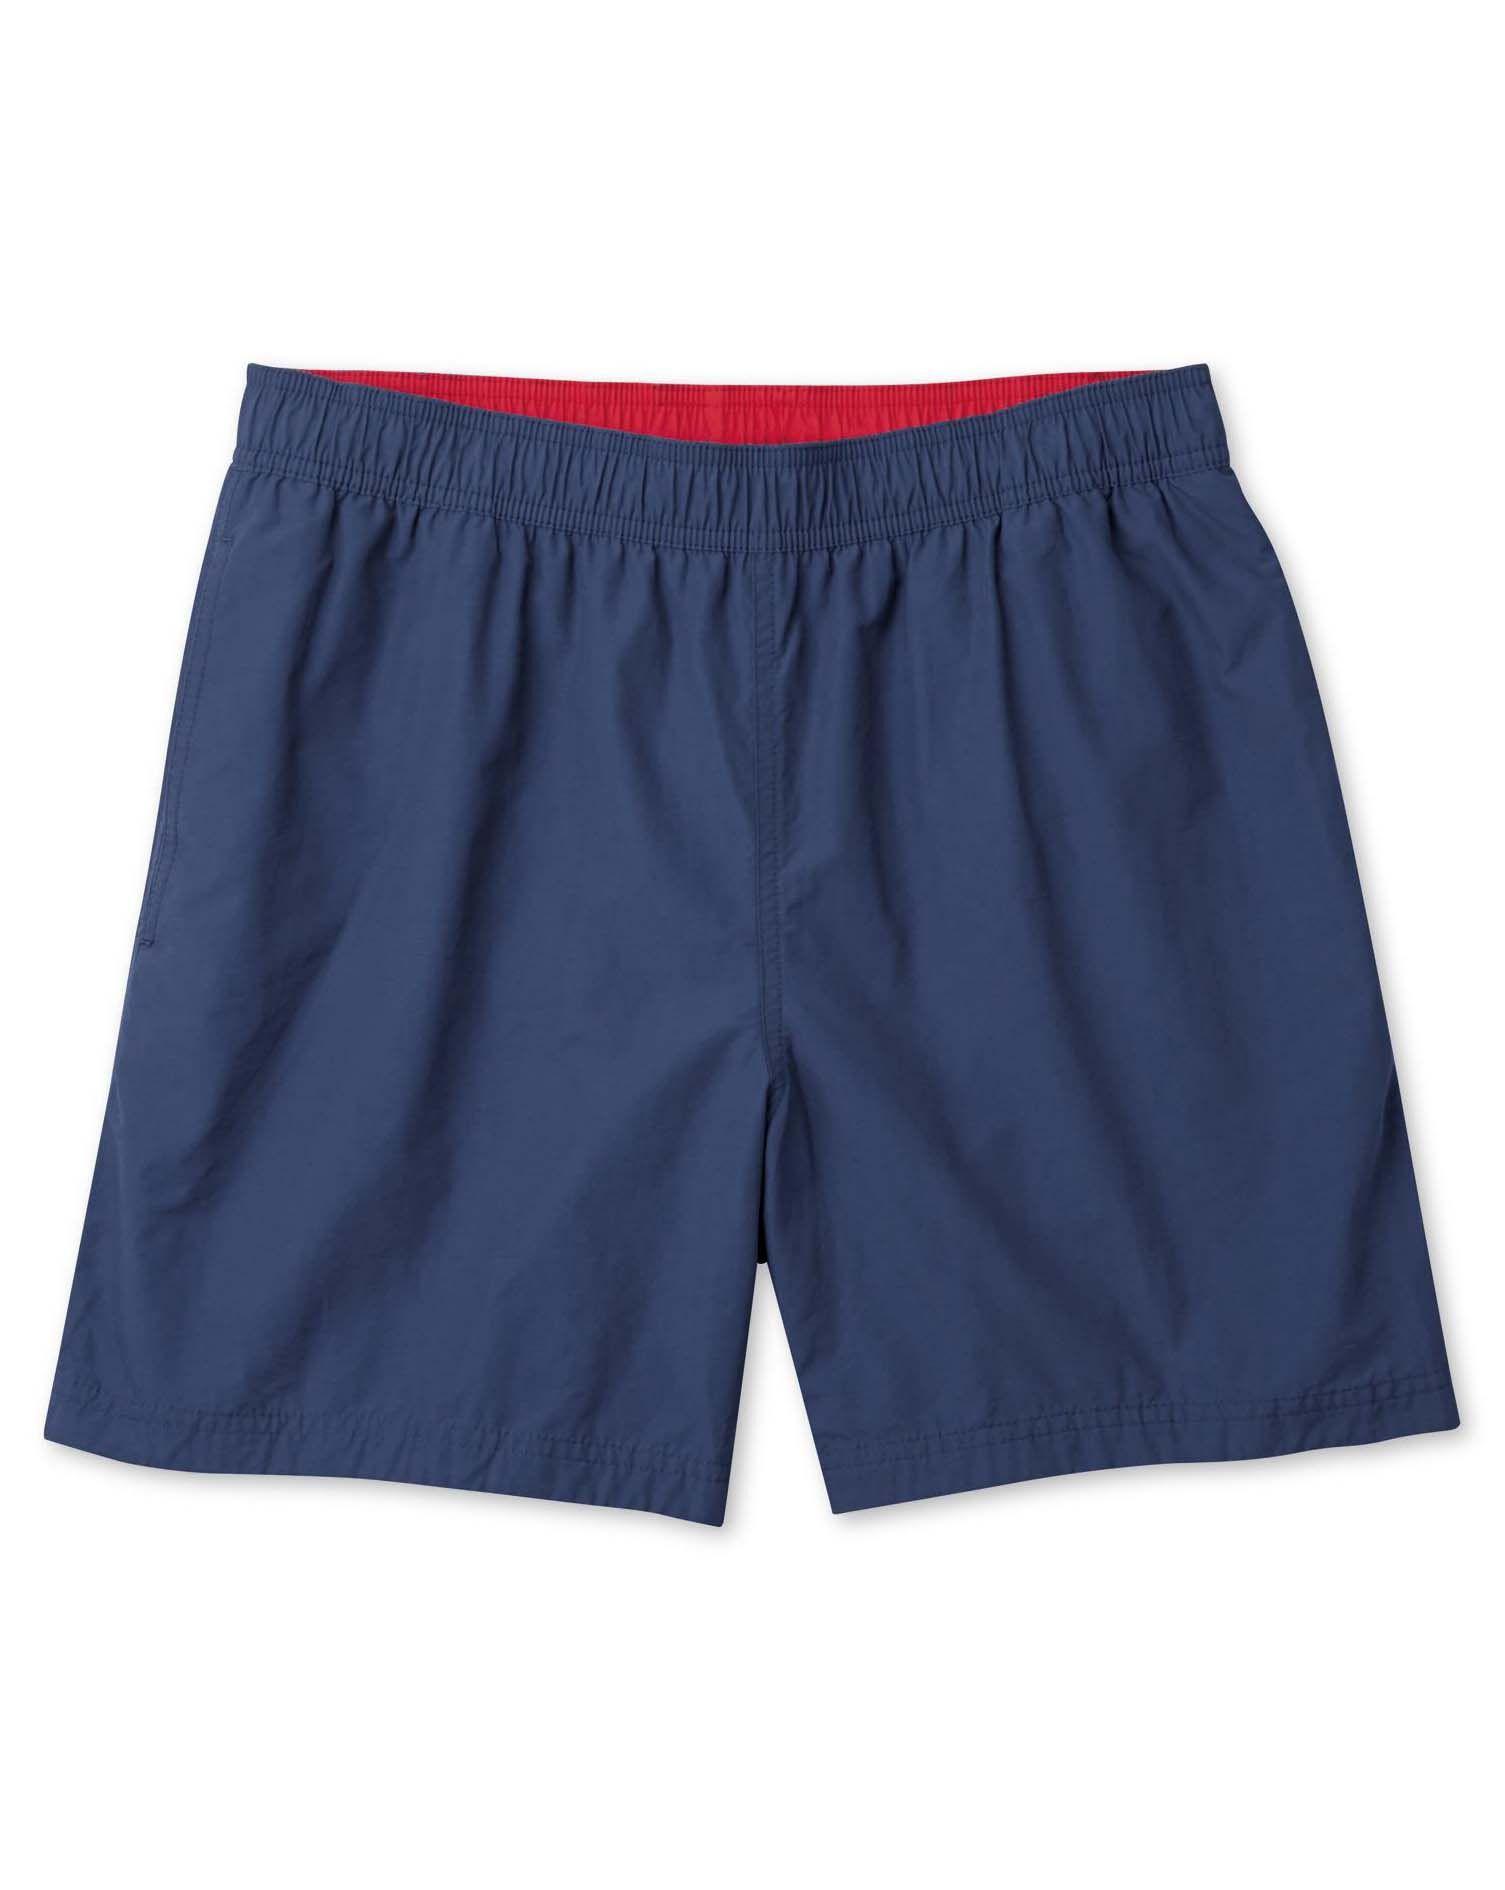 Navy Cotton Swim Shorts Size Small by Charles Tyrwhitt